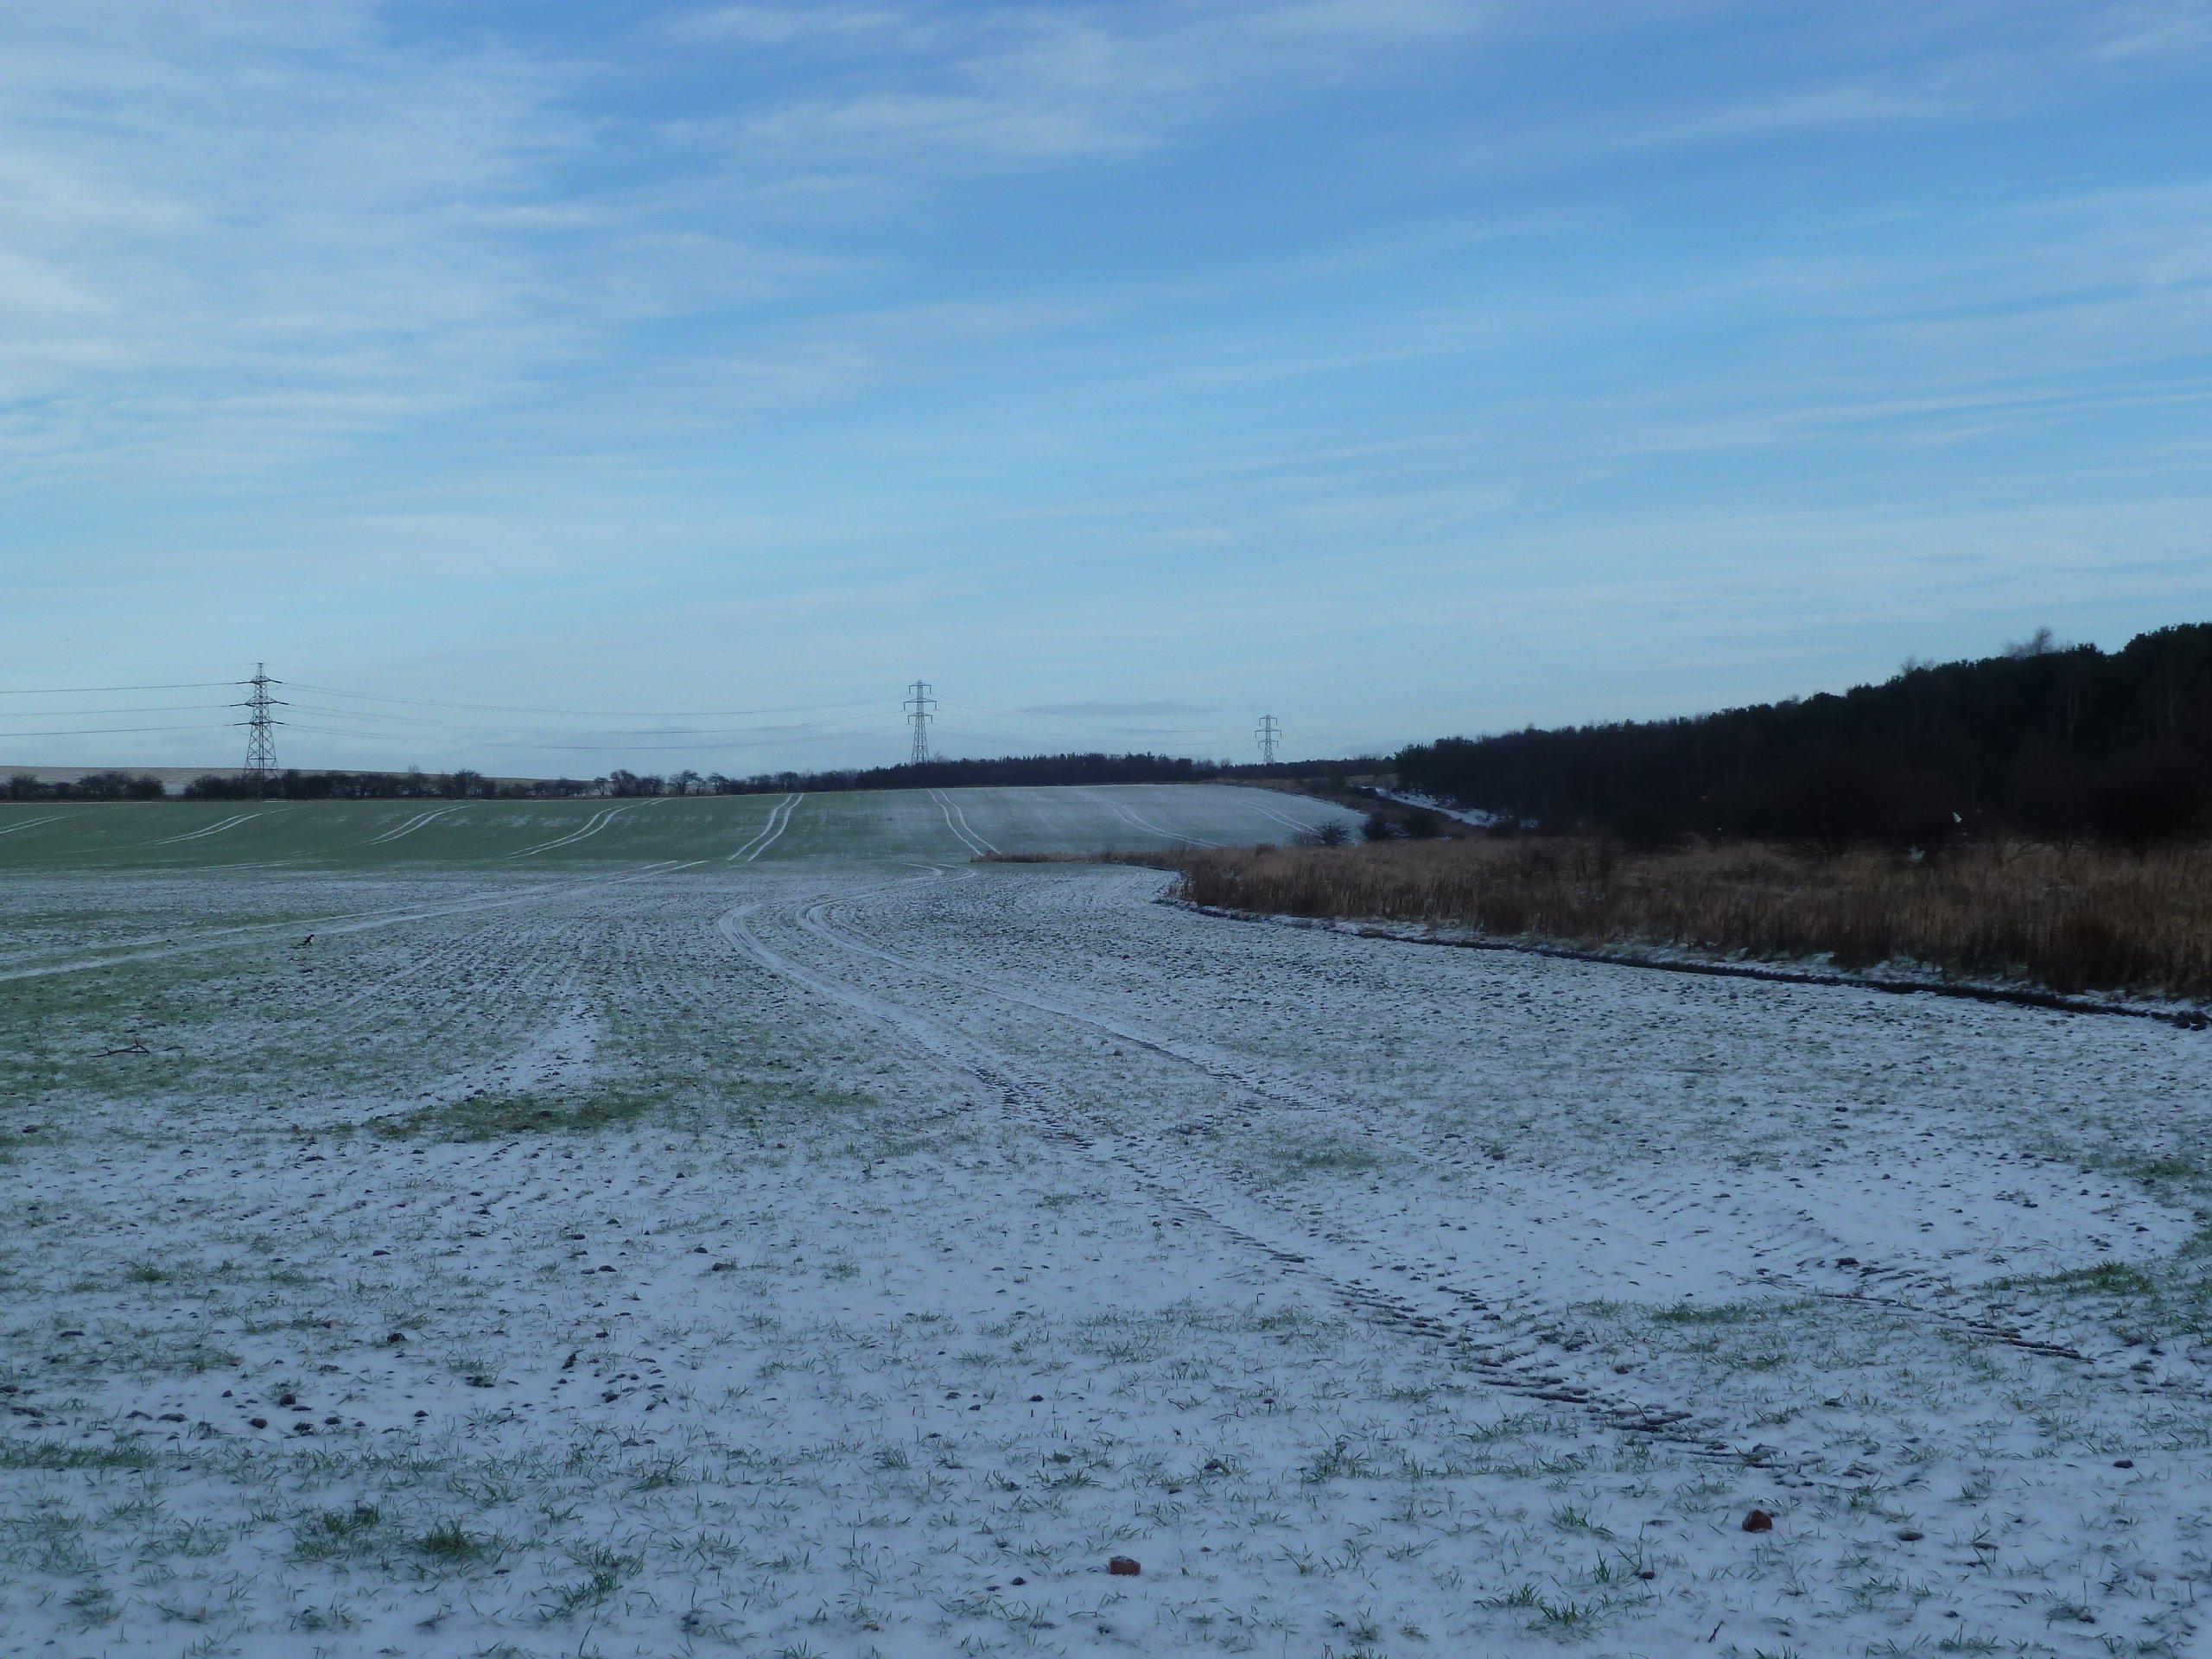 View across fields near Rising Sun Country Park